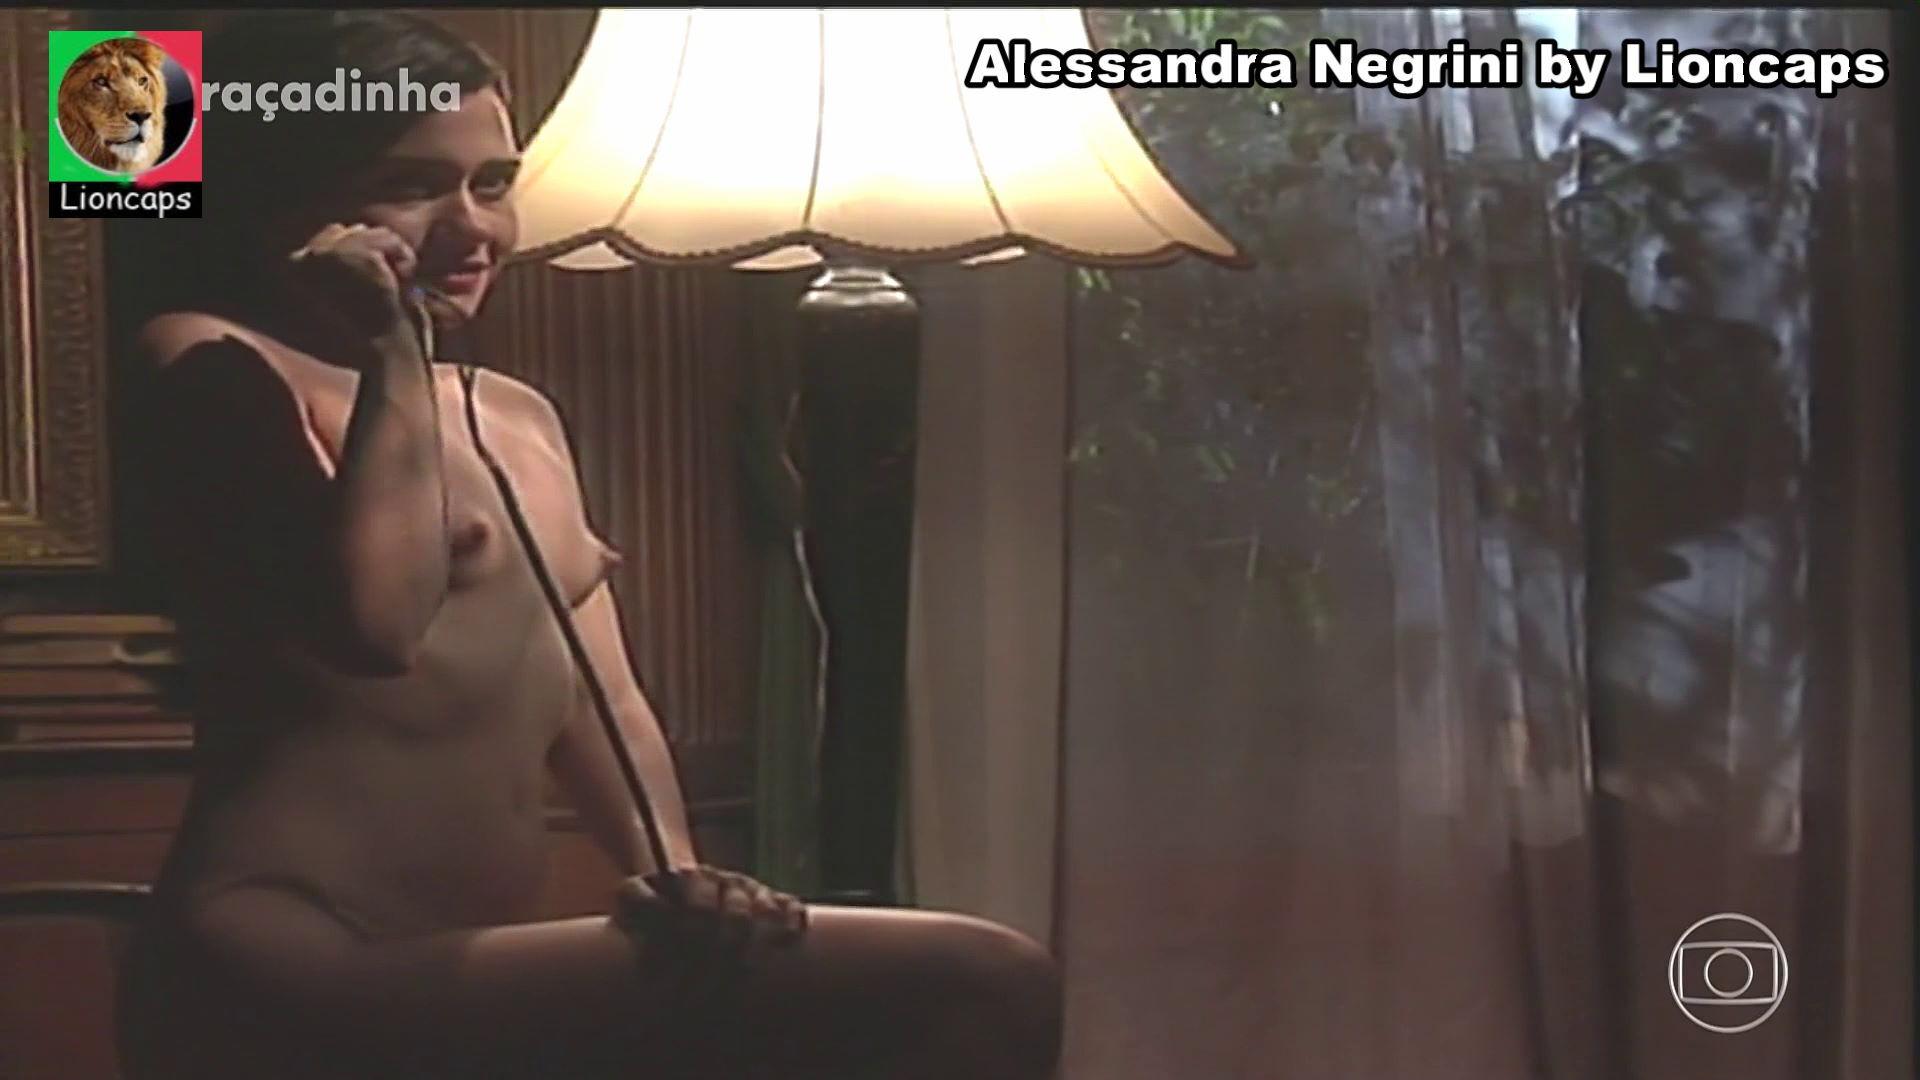 alessandra_negrini_vs200503-068 (4).JPG